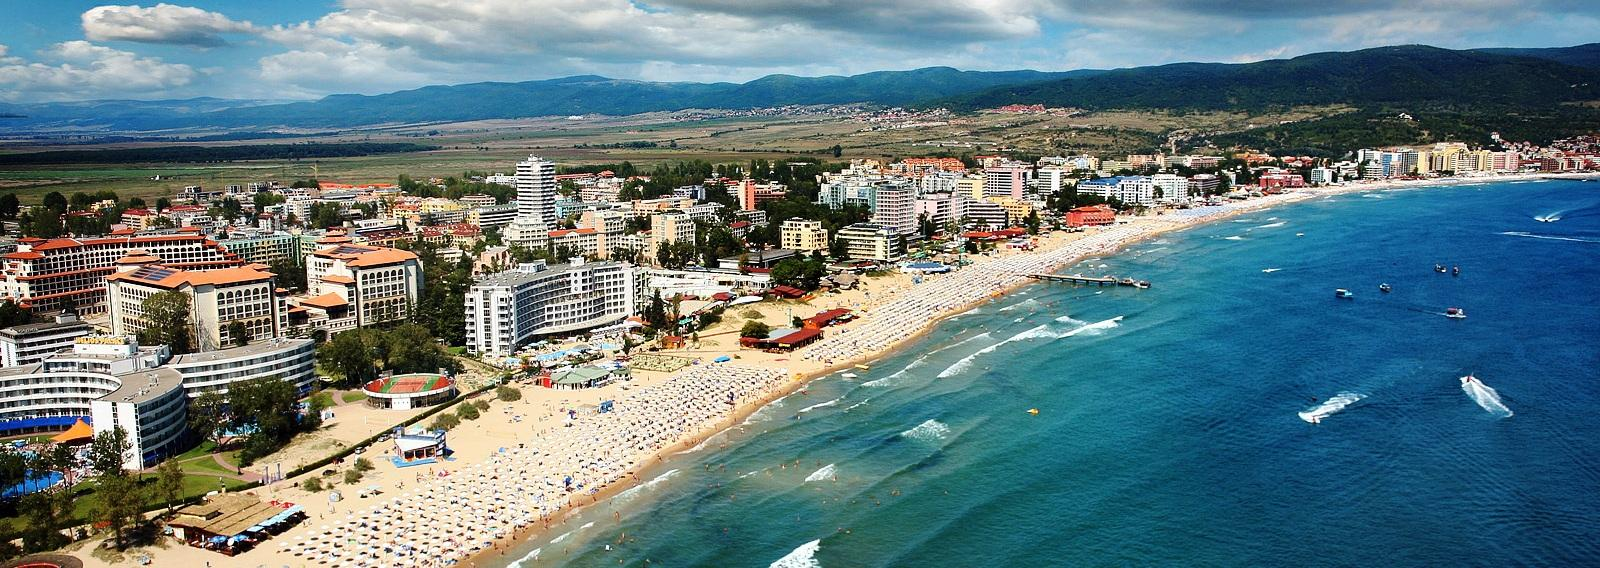 пляж солнечный берег болгария